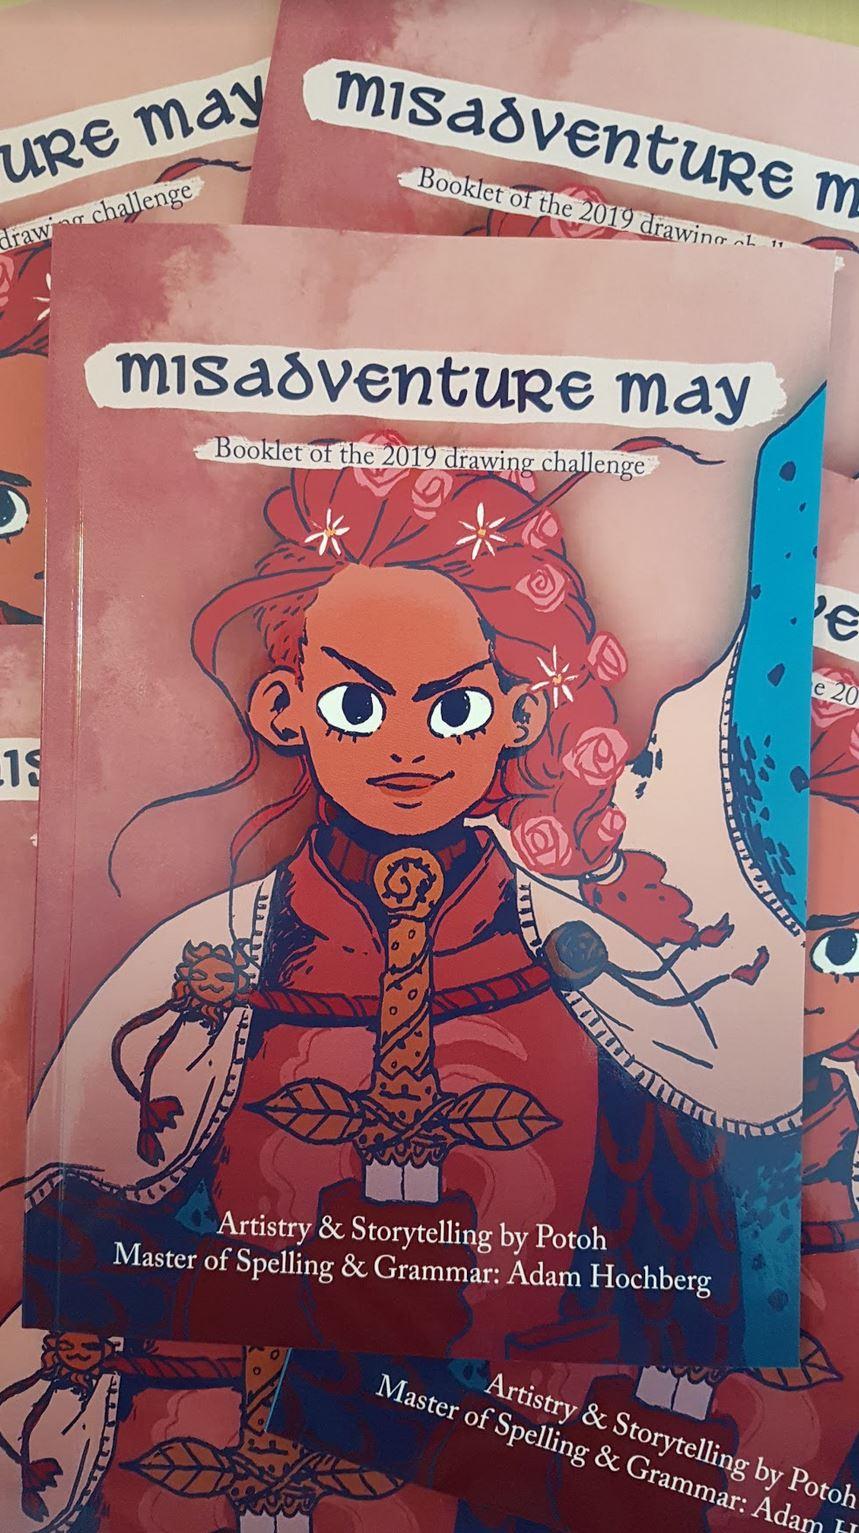 Misadventure May 2019 Booklet